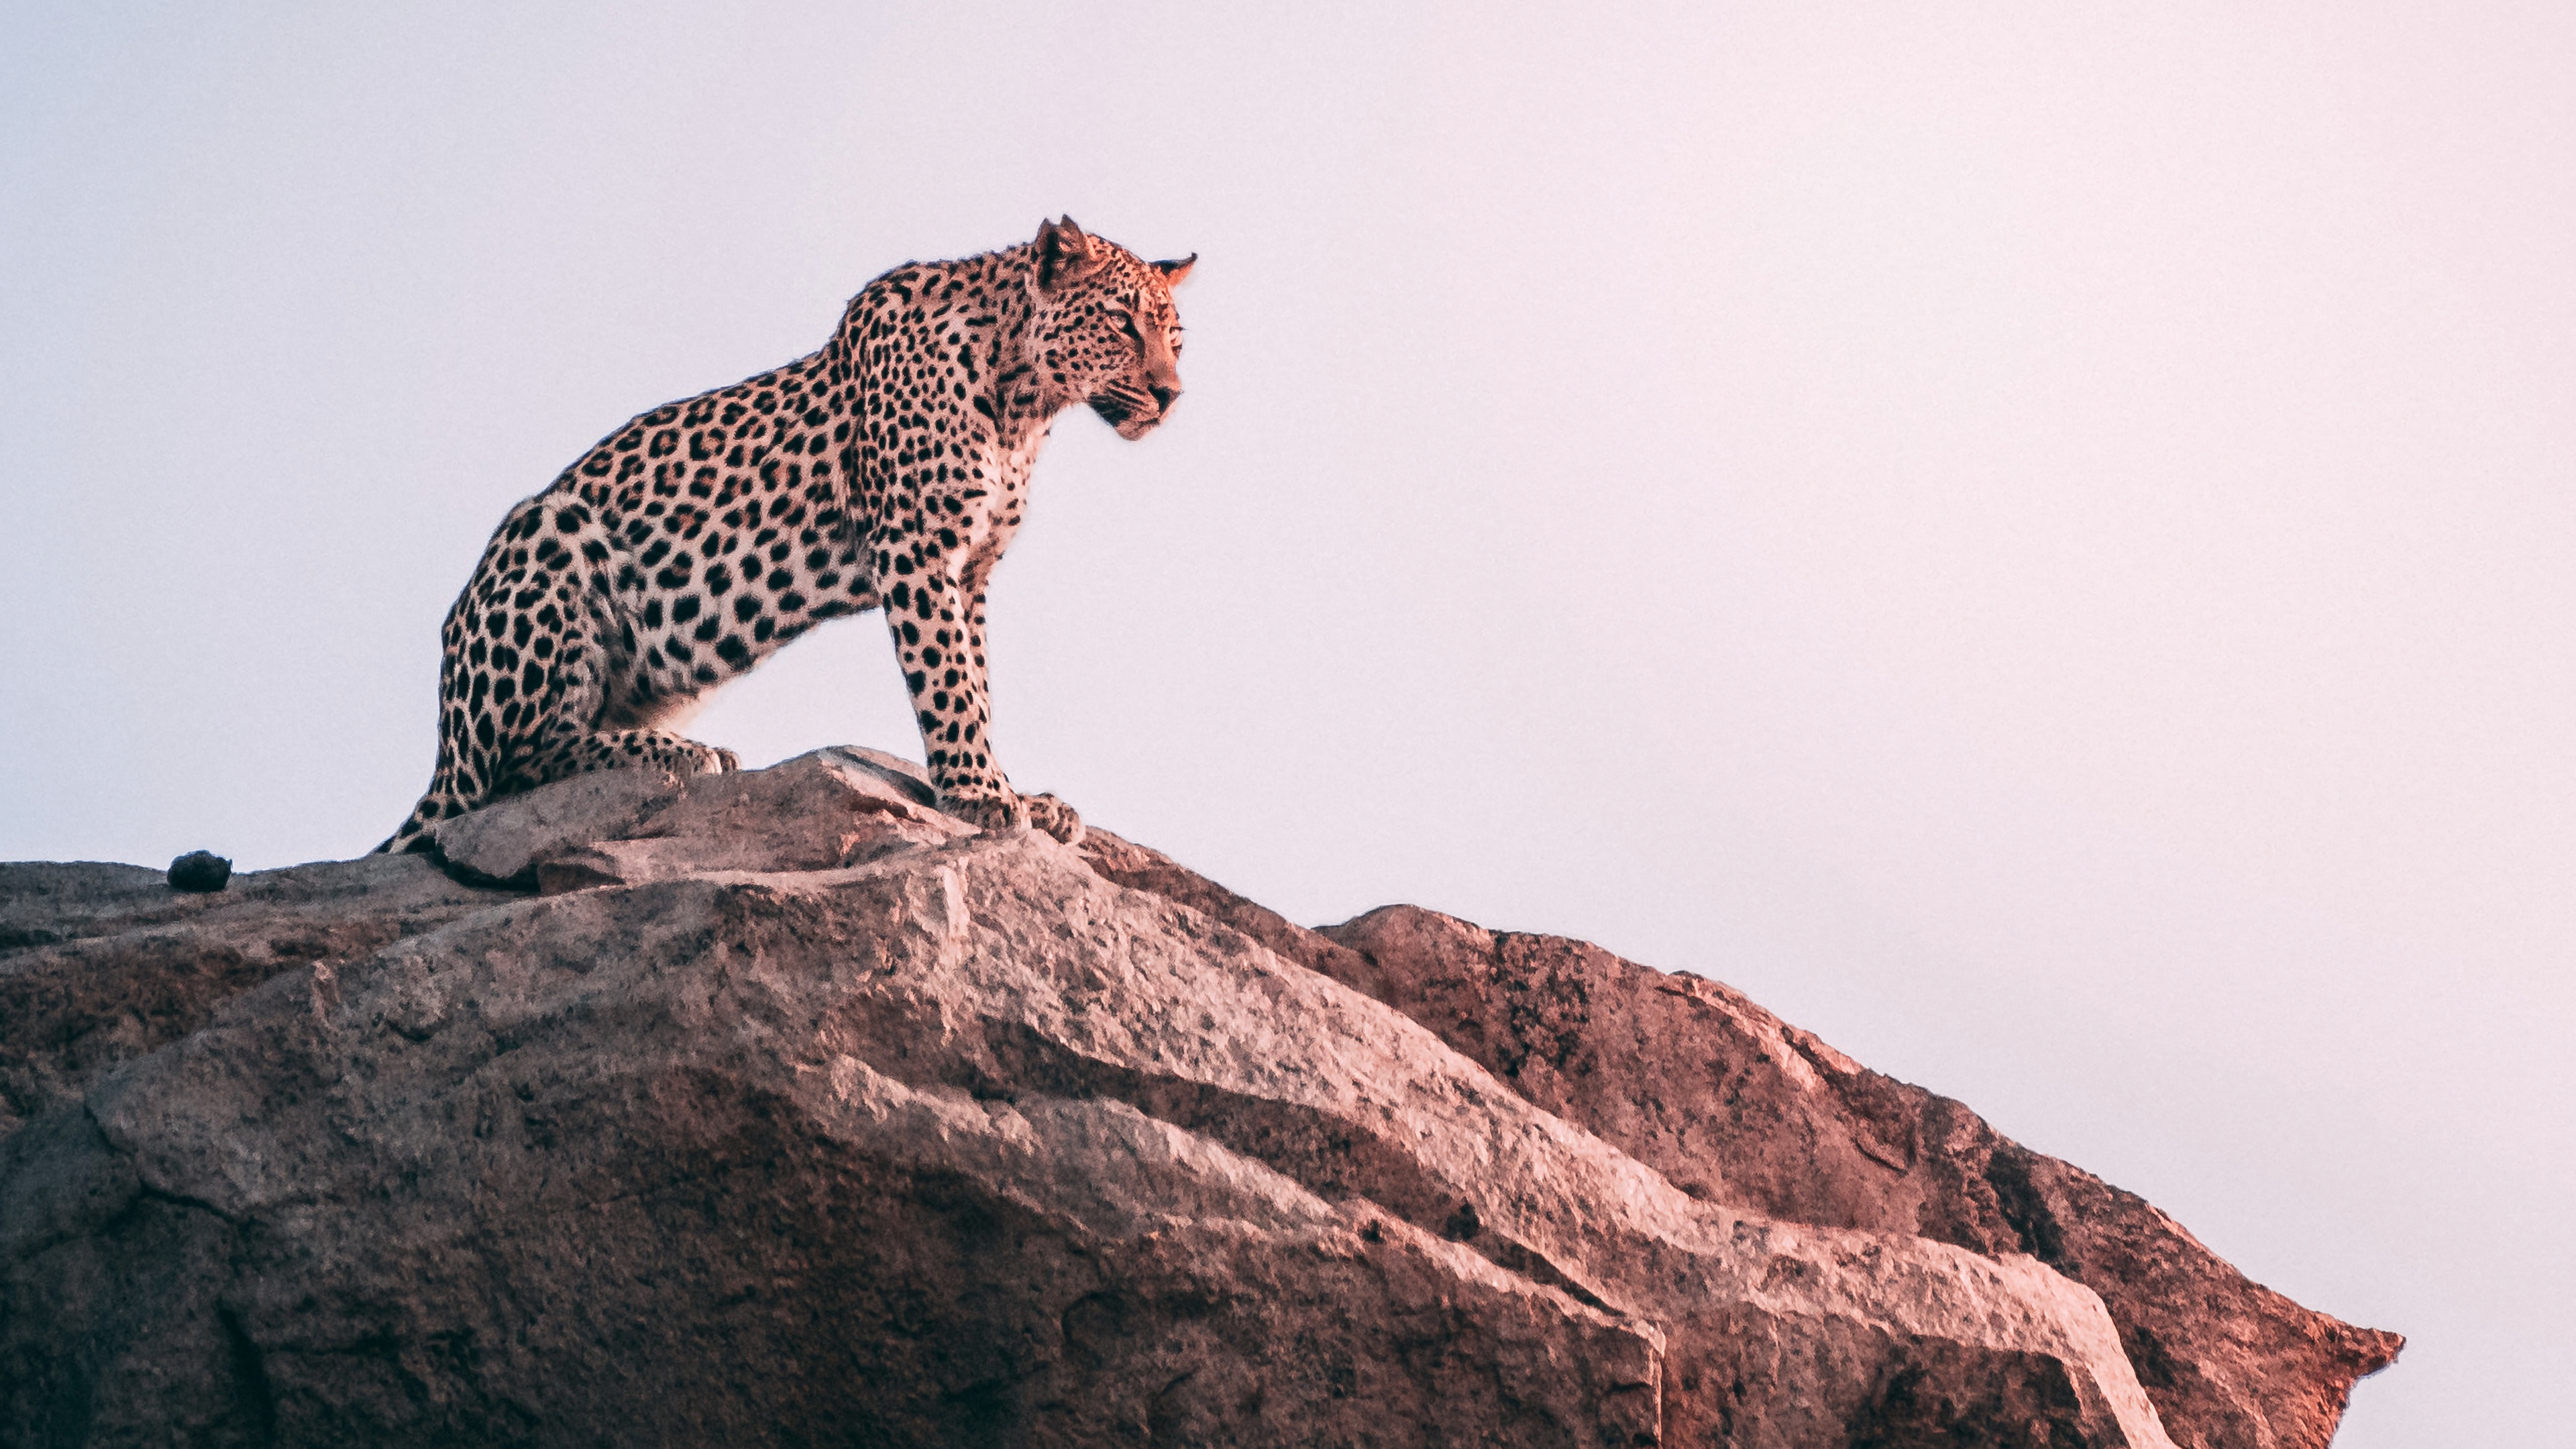 cheetah sight 1574938128 - Cheetah Sight -